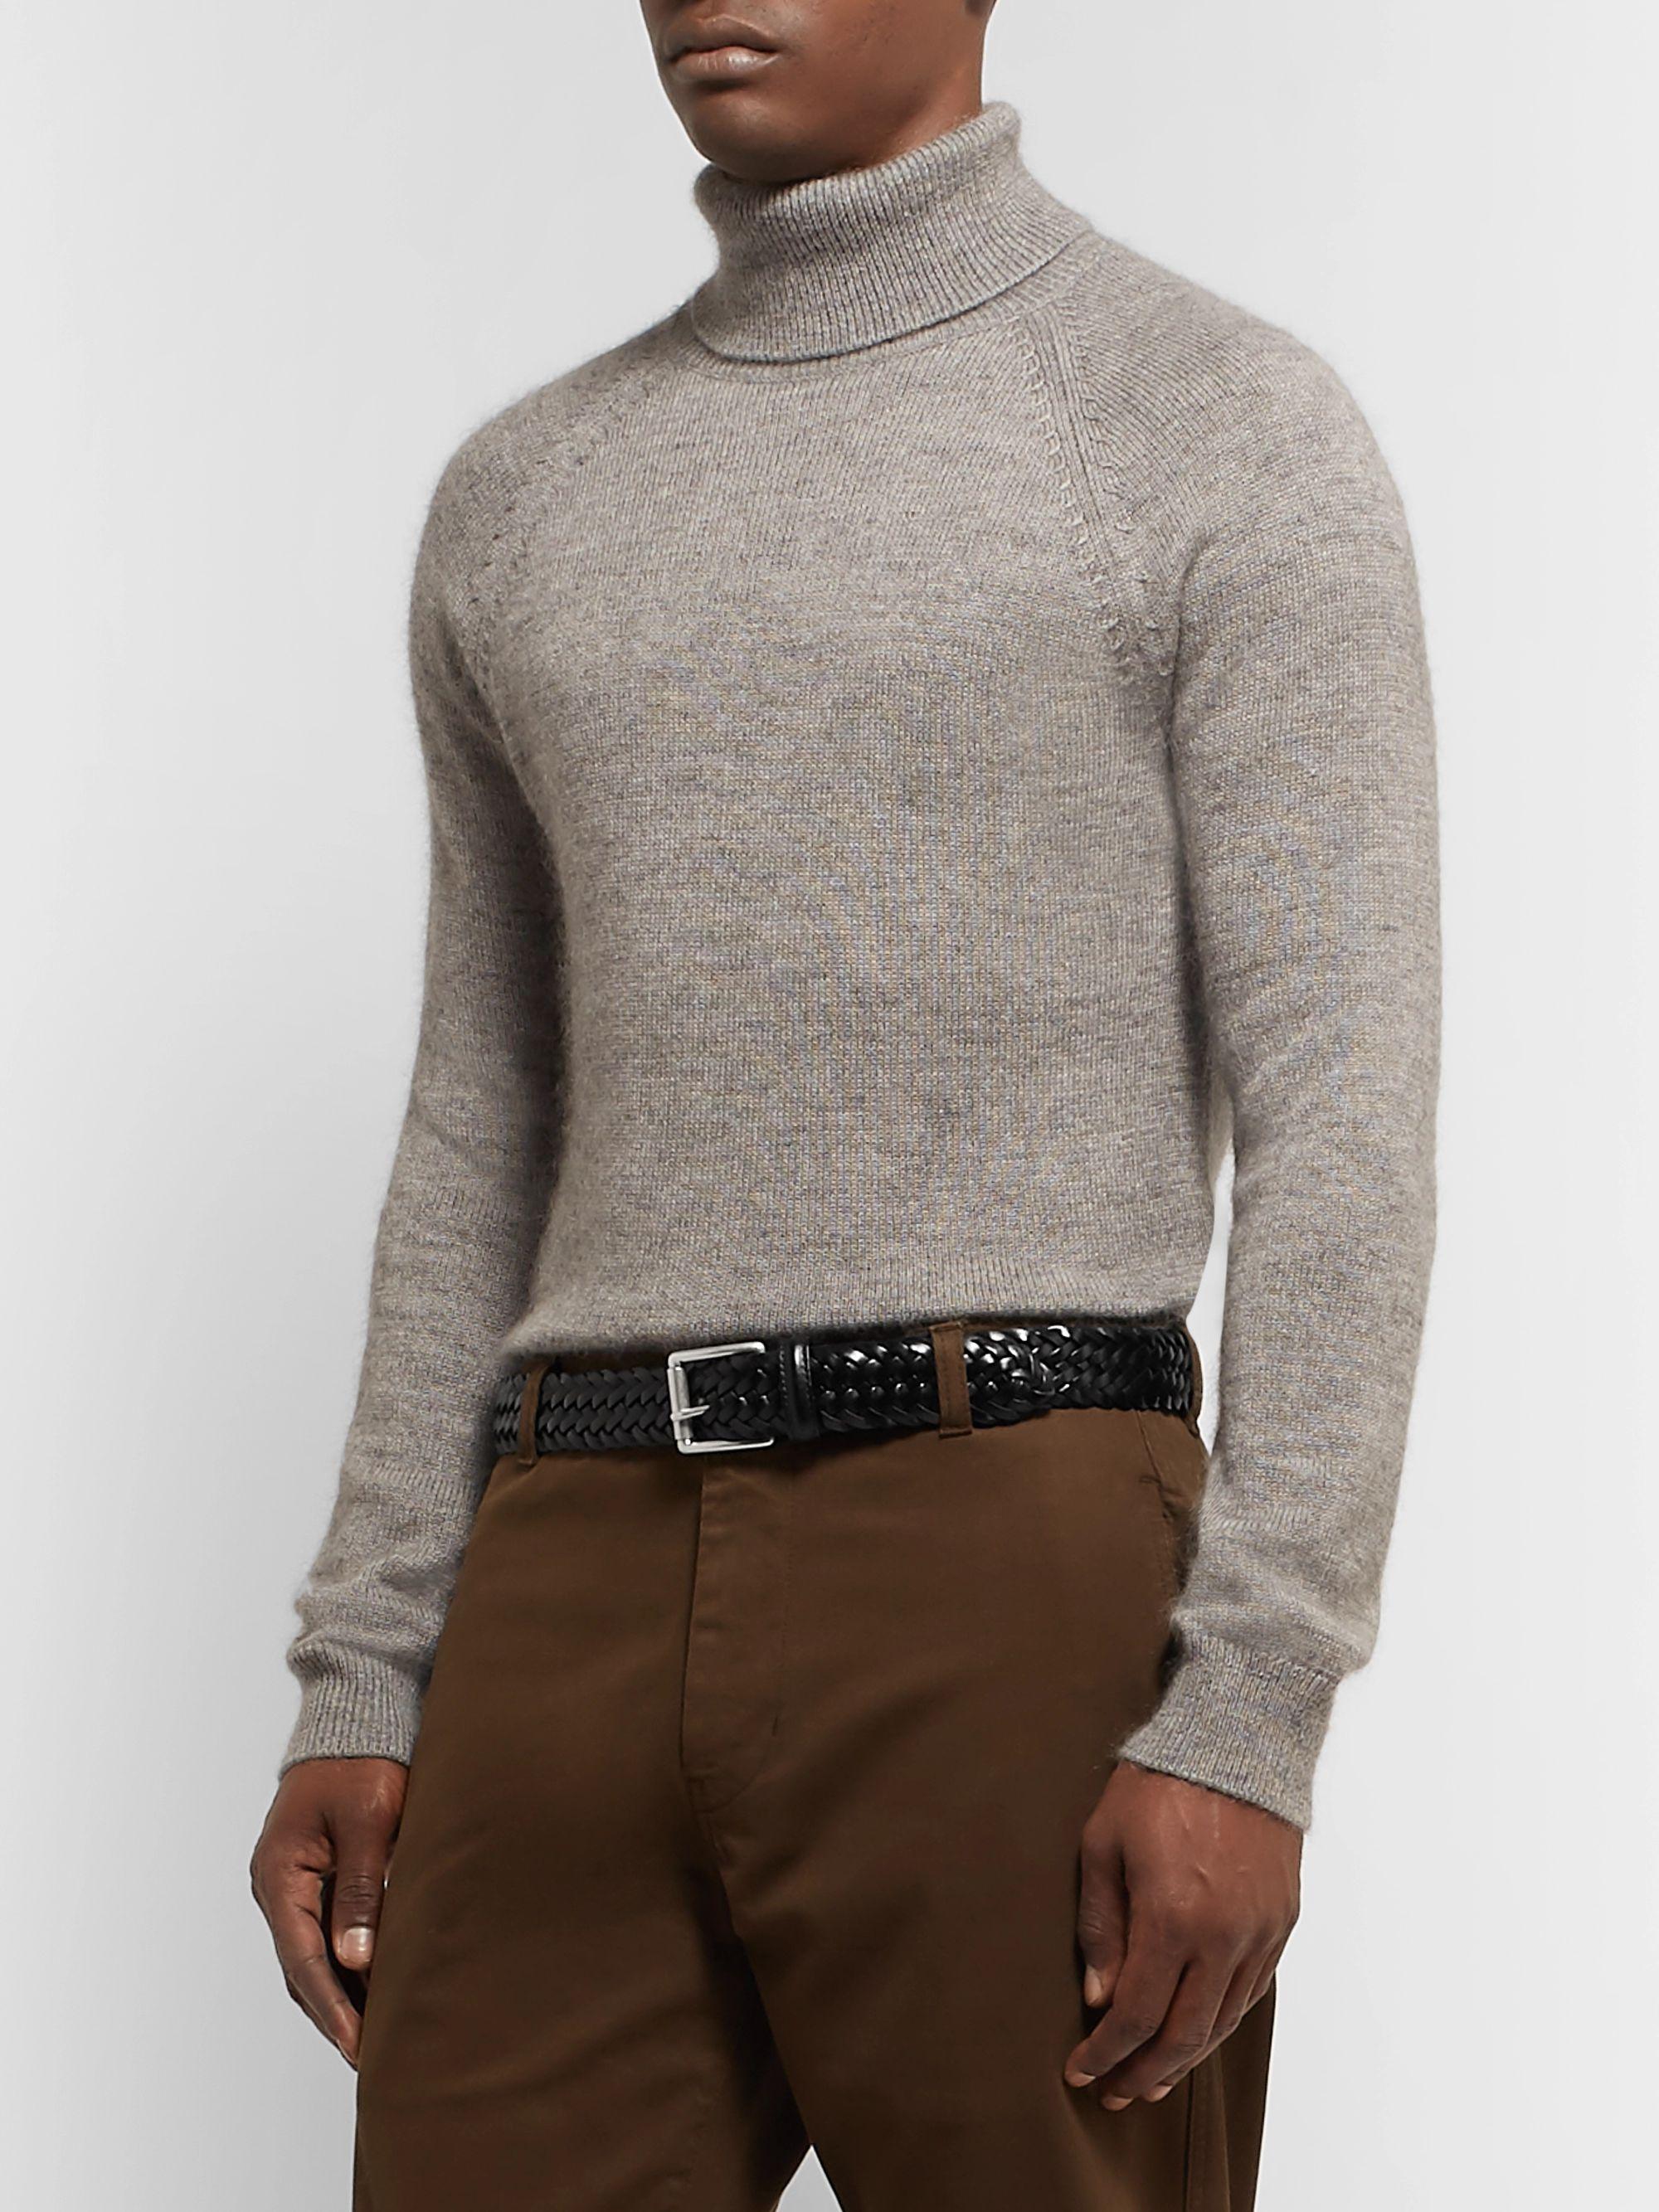 Black 3.5cm Woven Leather Belt | Anderson's